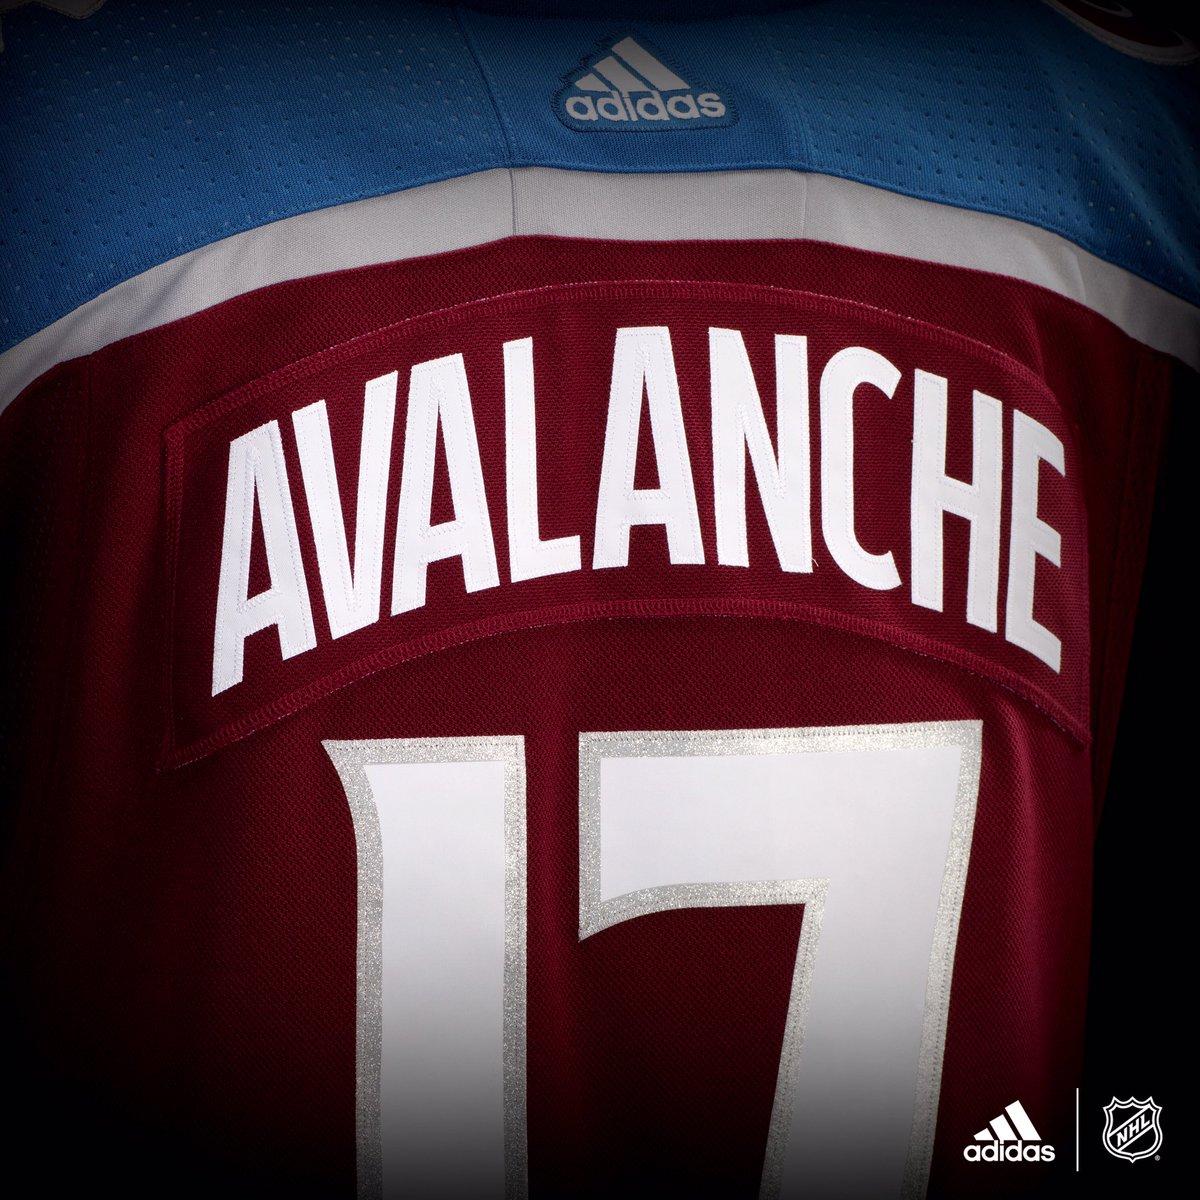 online store 79301 9f0eb colorado avalanche jersey adidas